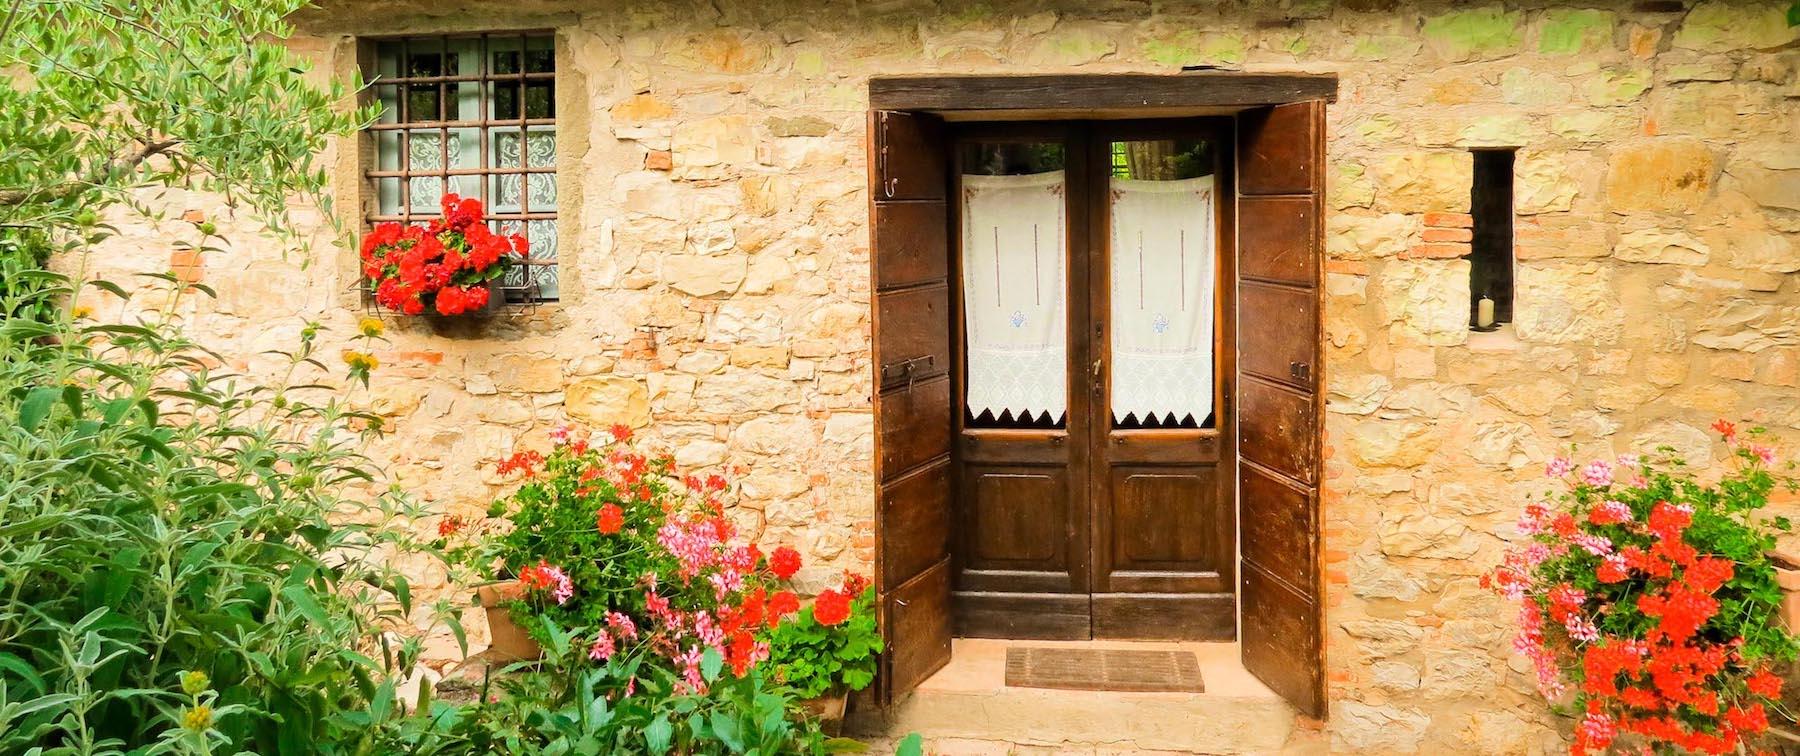 piccola villa borgo argenina - Chianti Siena Tuscany villas